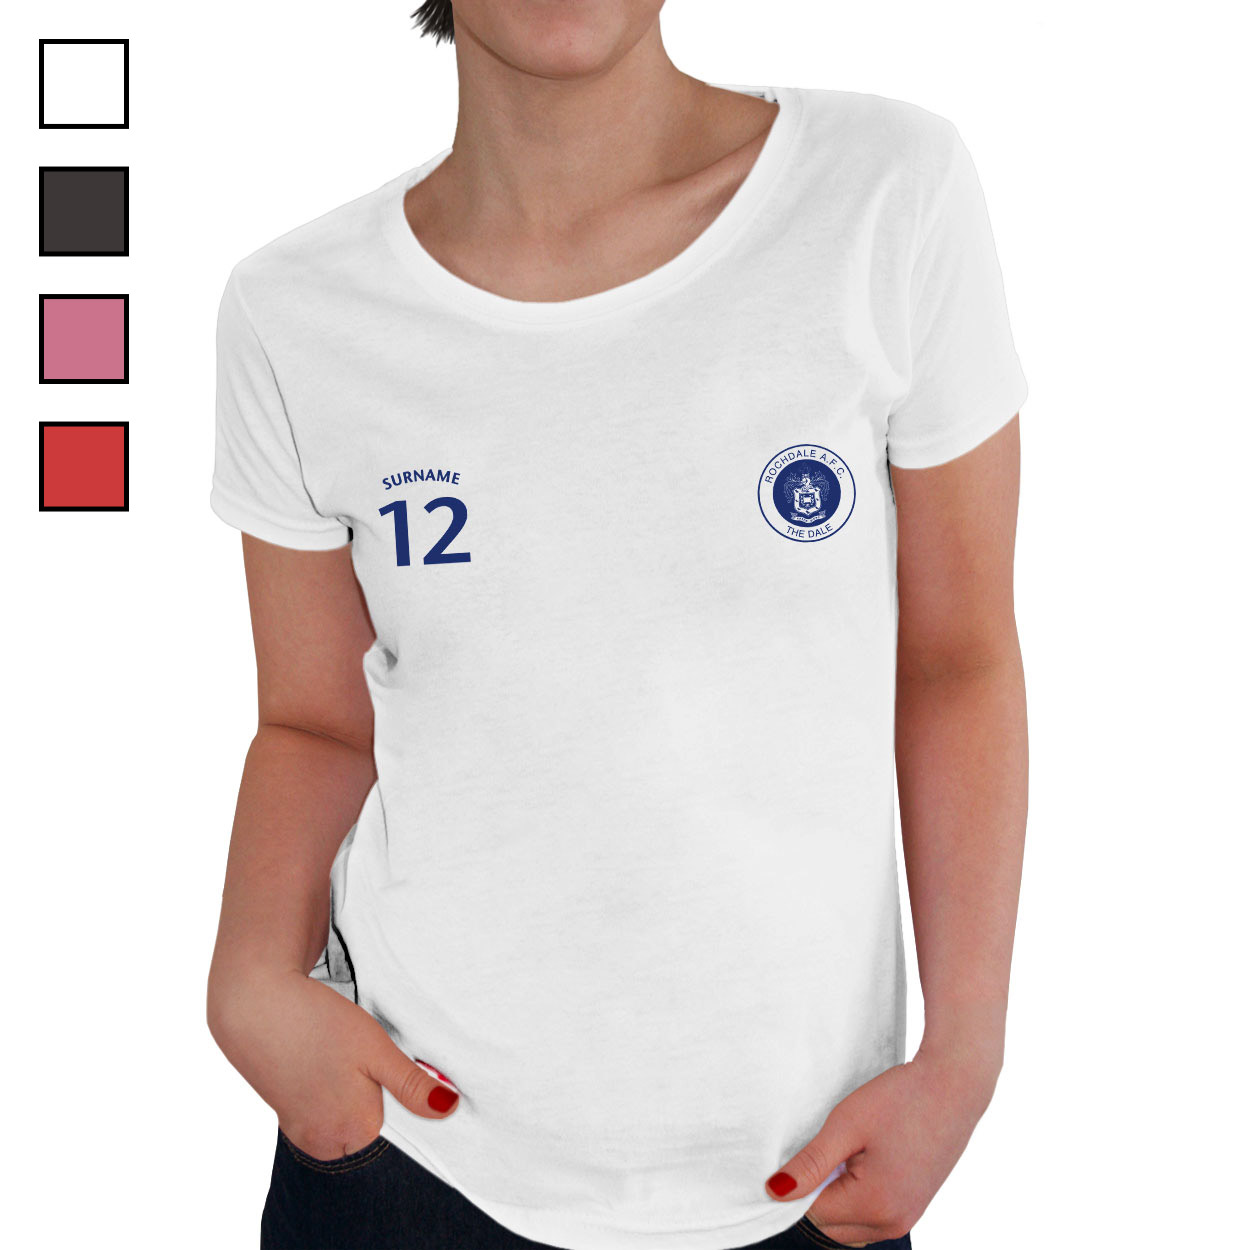 Rochdale AFC Ladies Sports T-Shirt